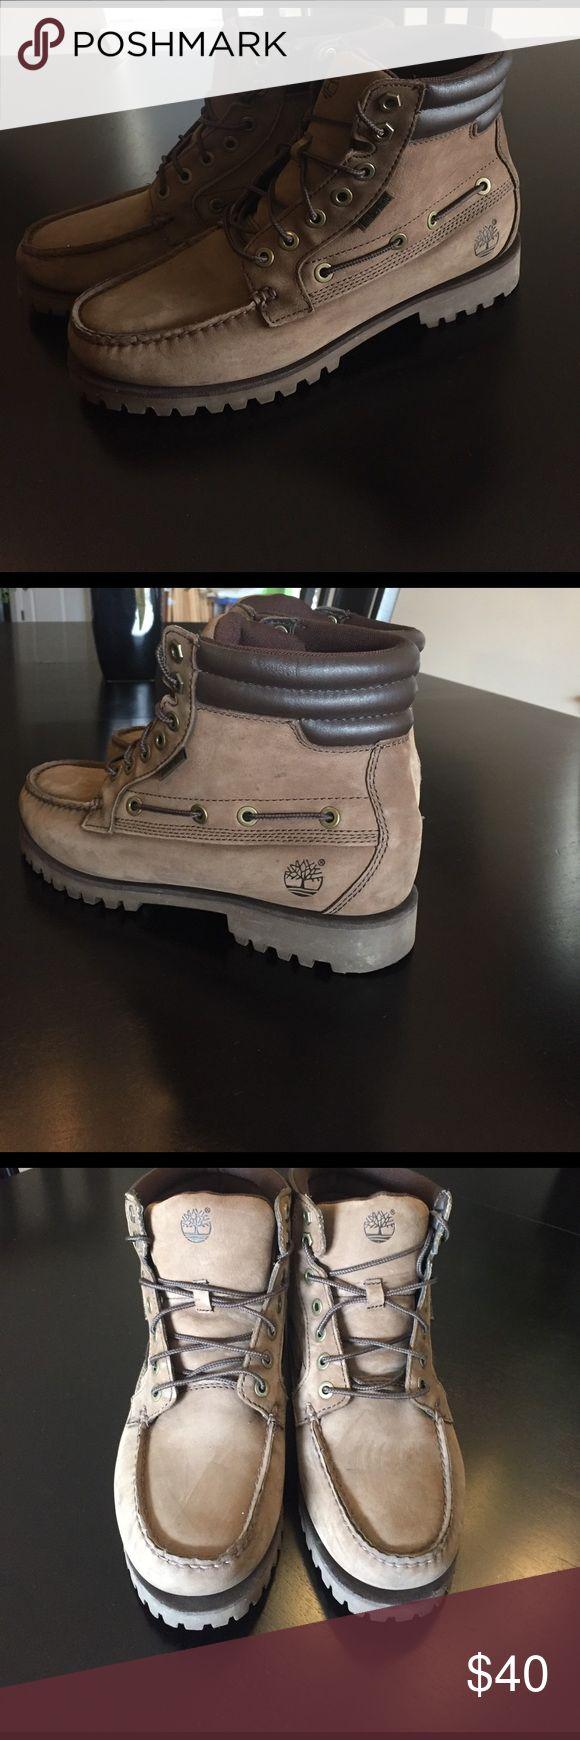 Men's brown Timberland boots Men's brown Timberland boots. Size 9.5. Barely worn! Timberland Shoes Boots